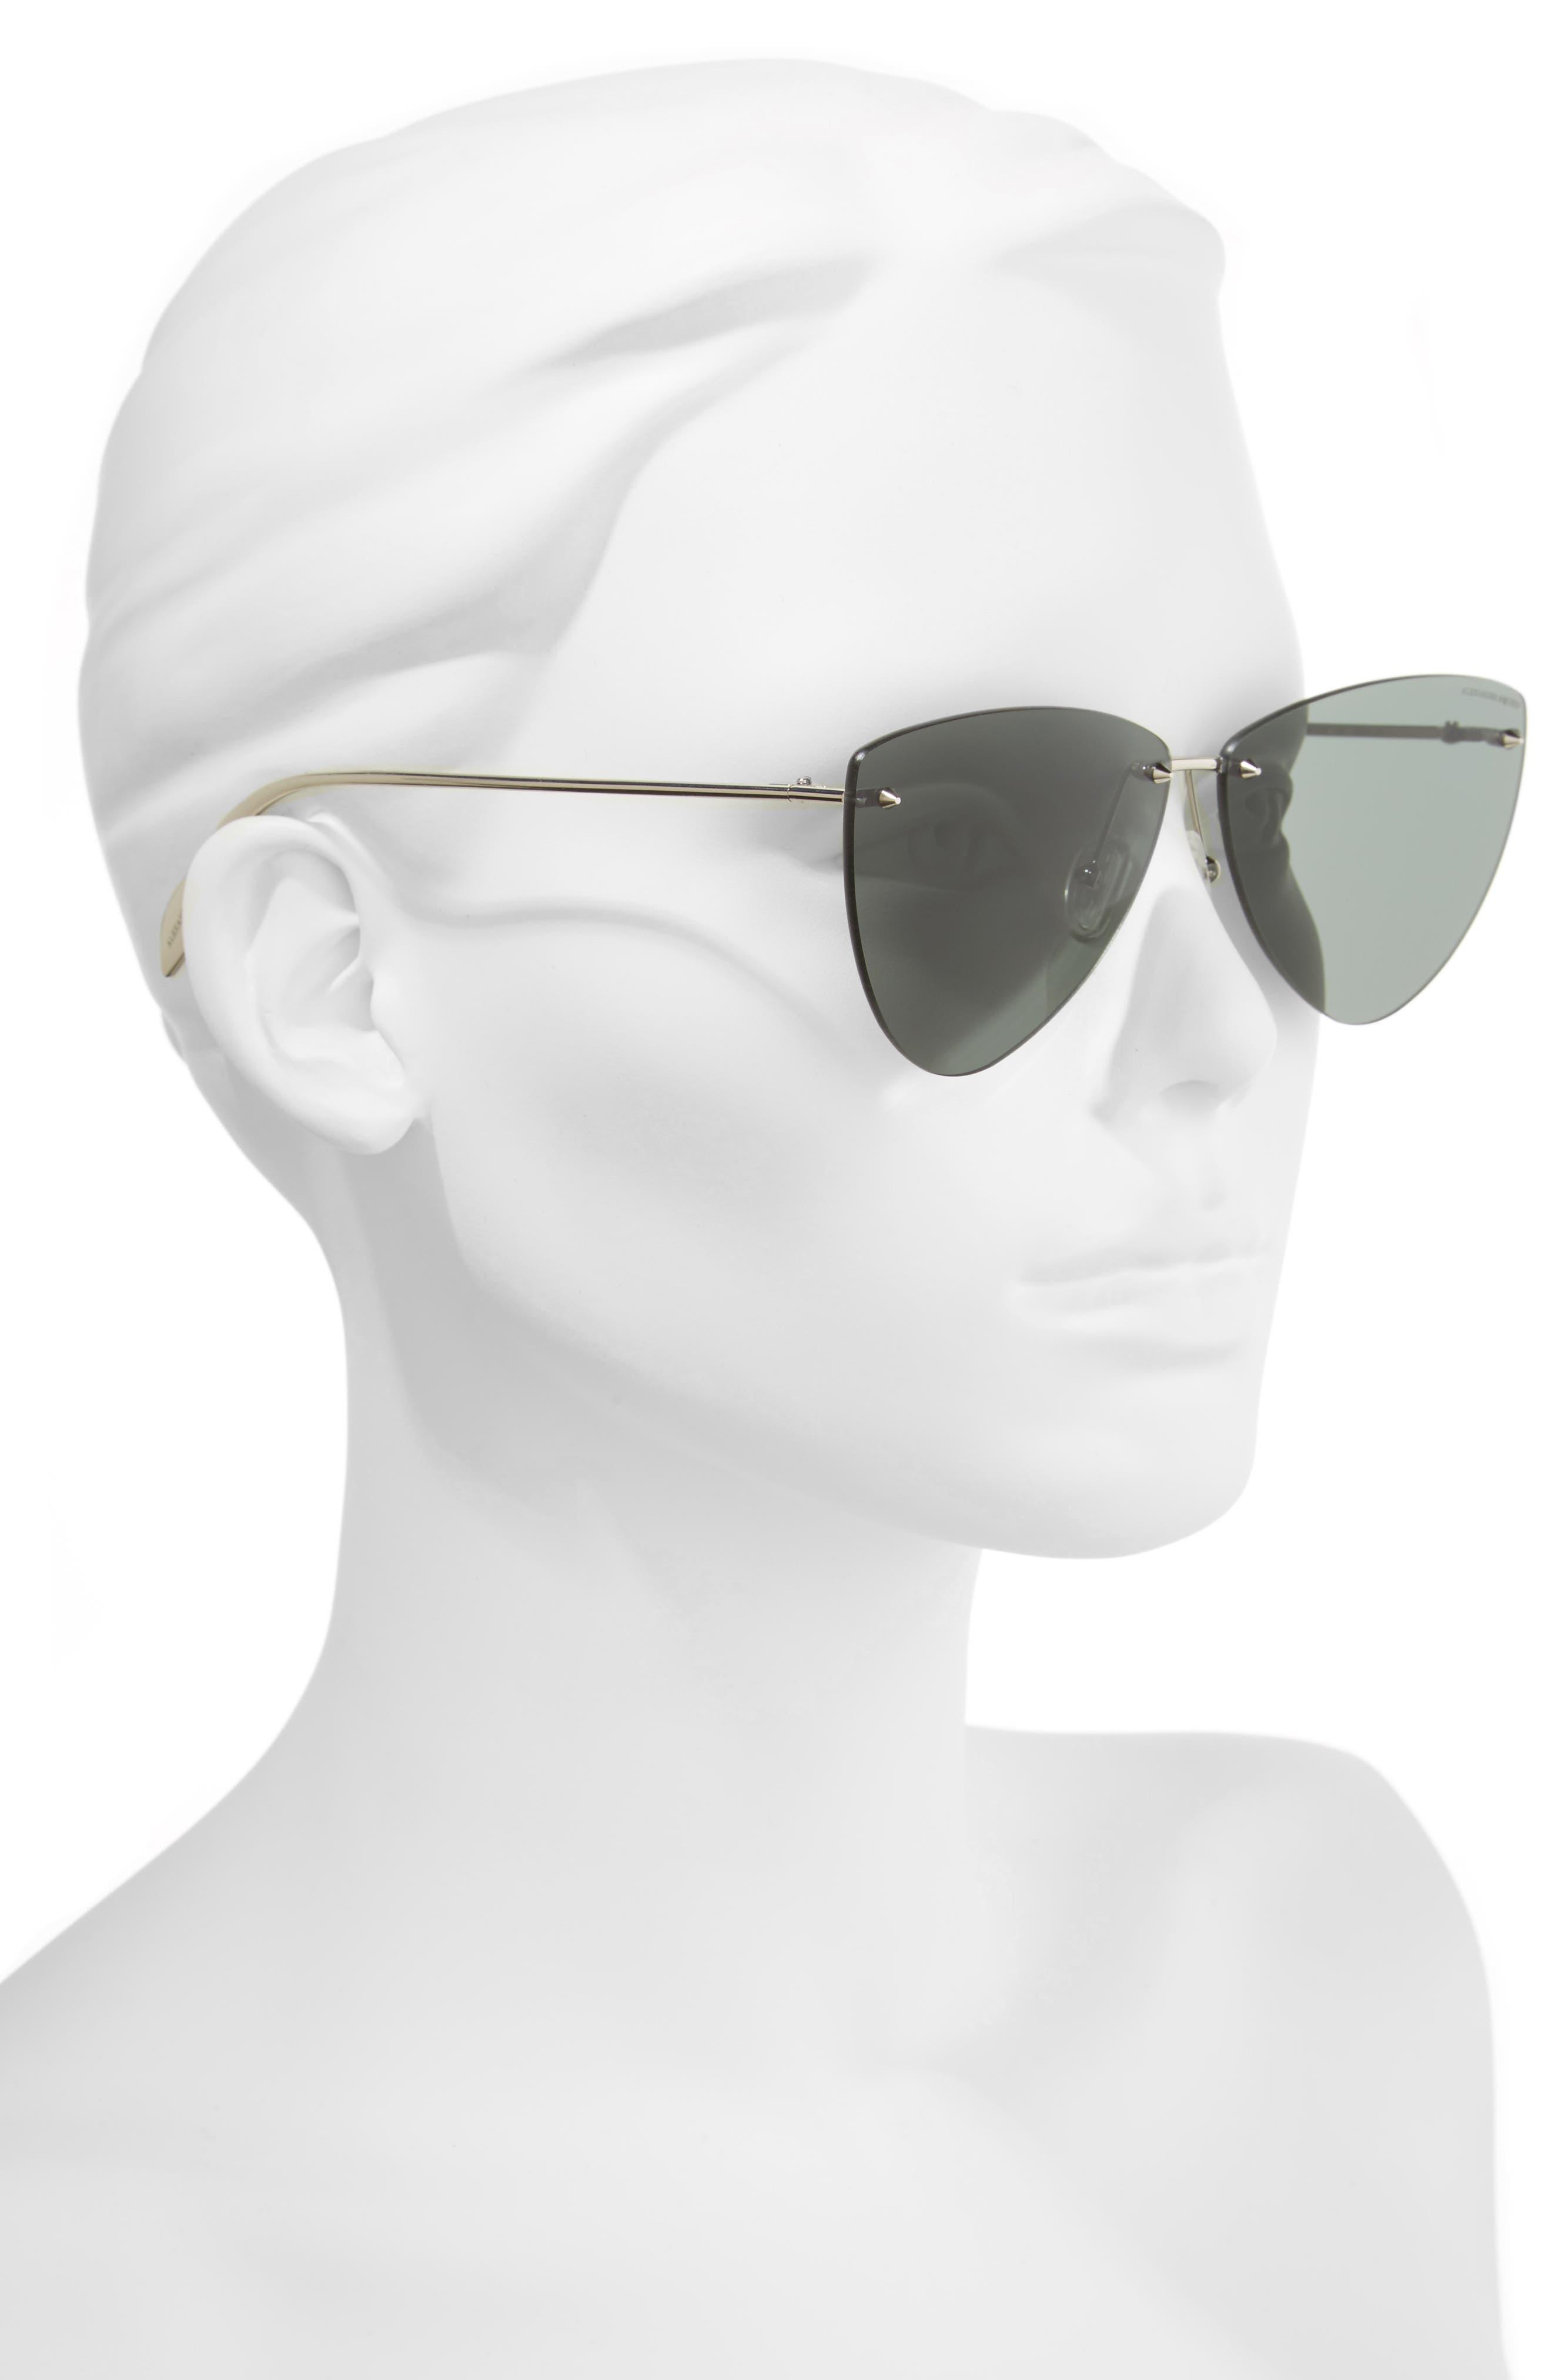 63mm Oversize Rimless Sunglasses,                             Alternate thumbnail 2, color,                             SILVER